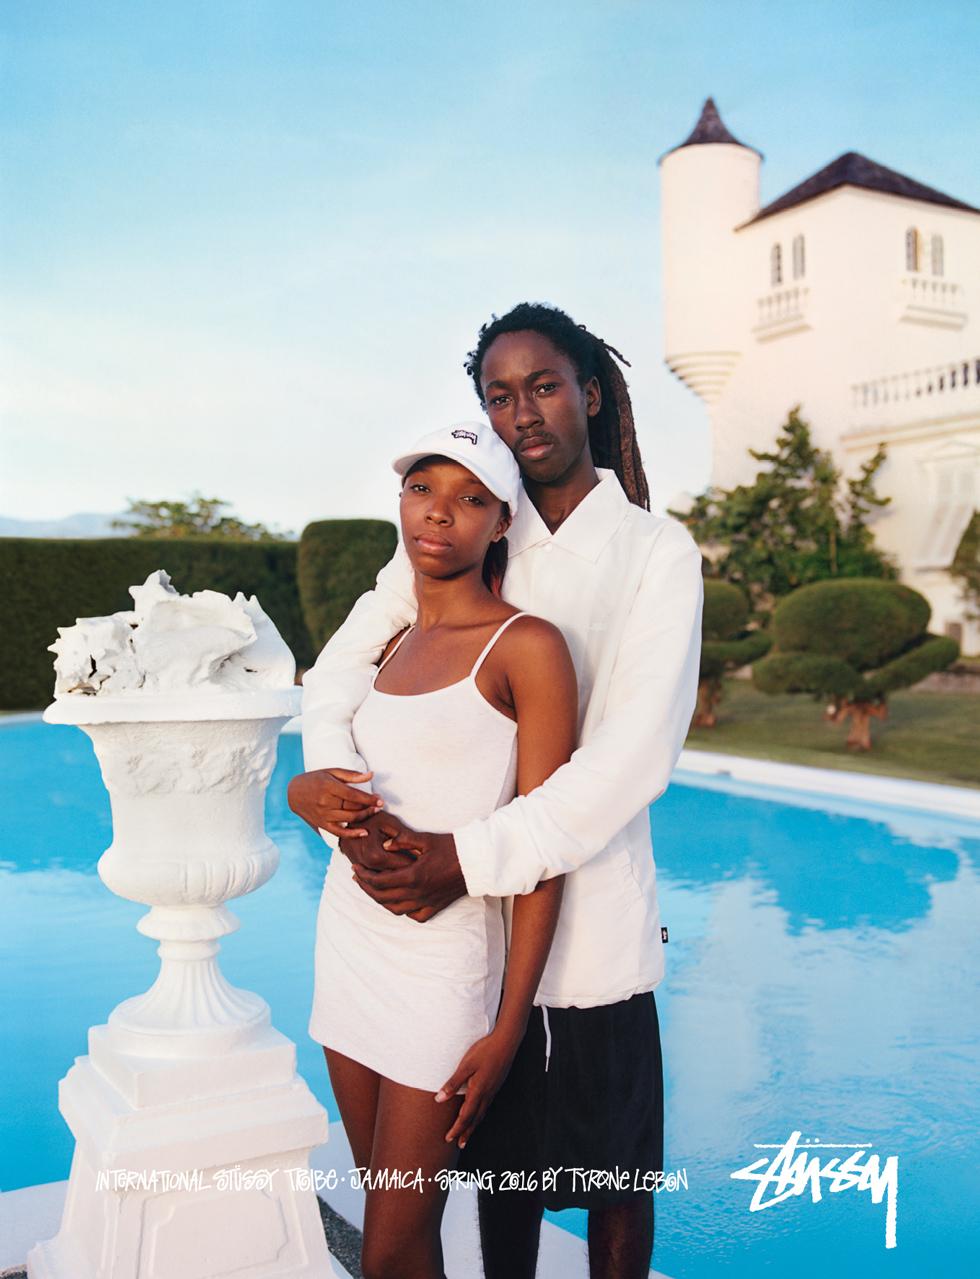 Stussy-Spring-2016-Jamaica-Campaign-by-Tyrone-Lebon6.jpg